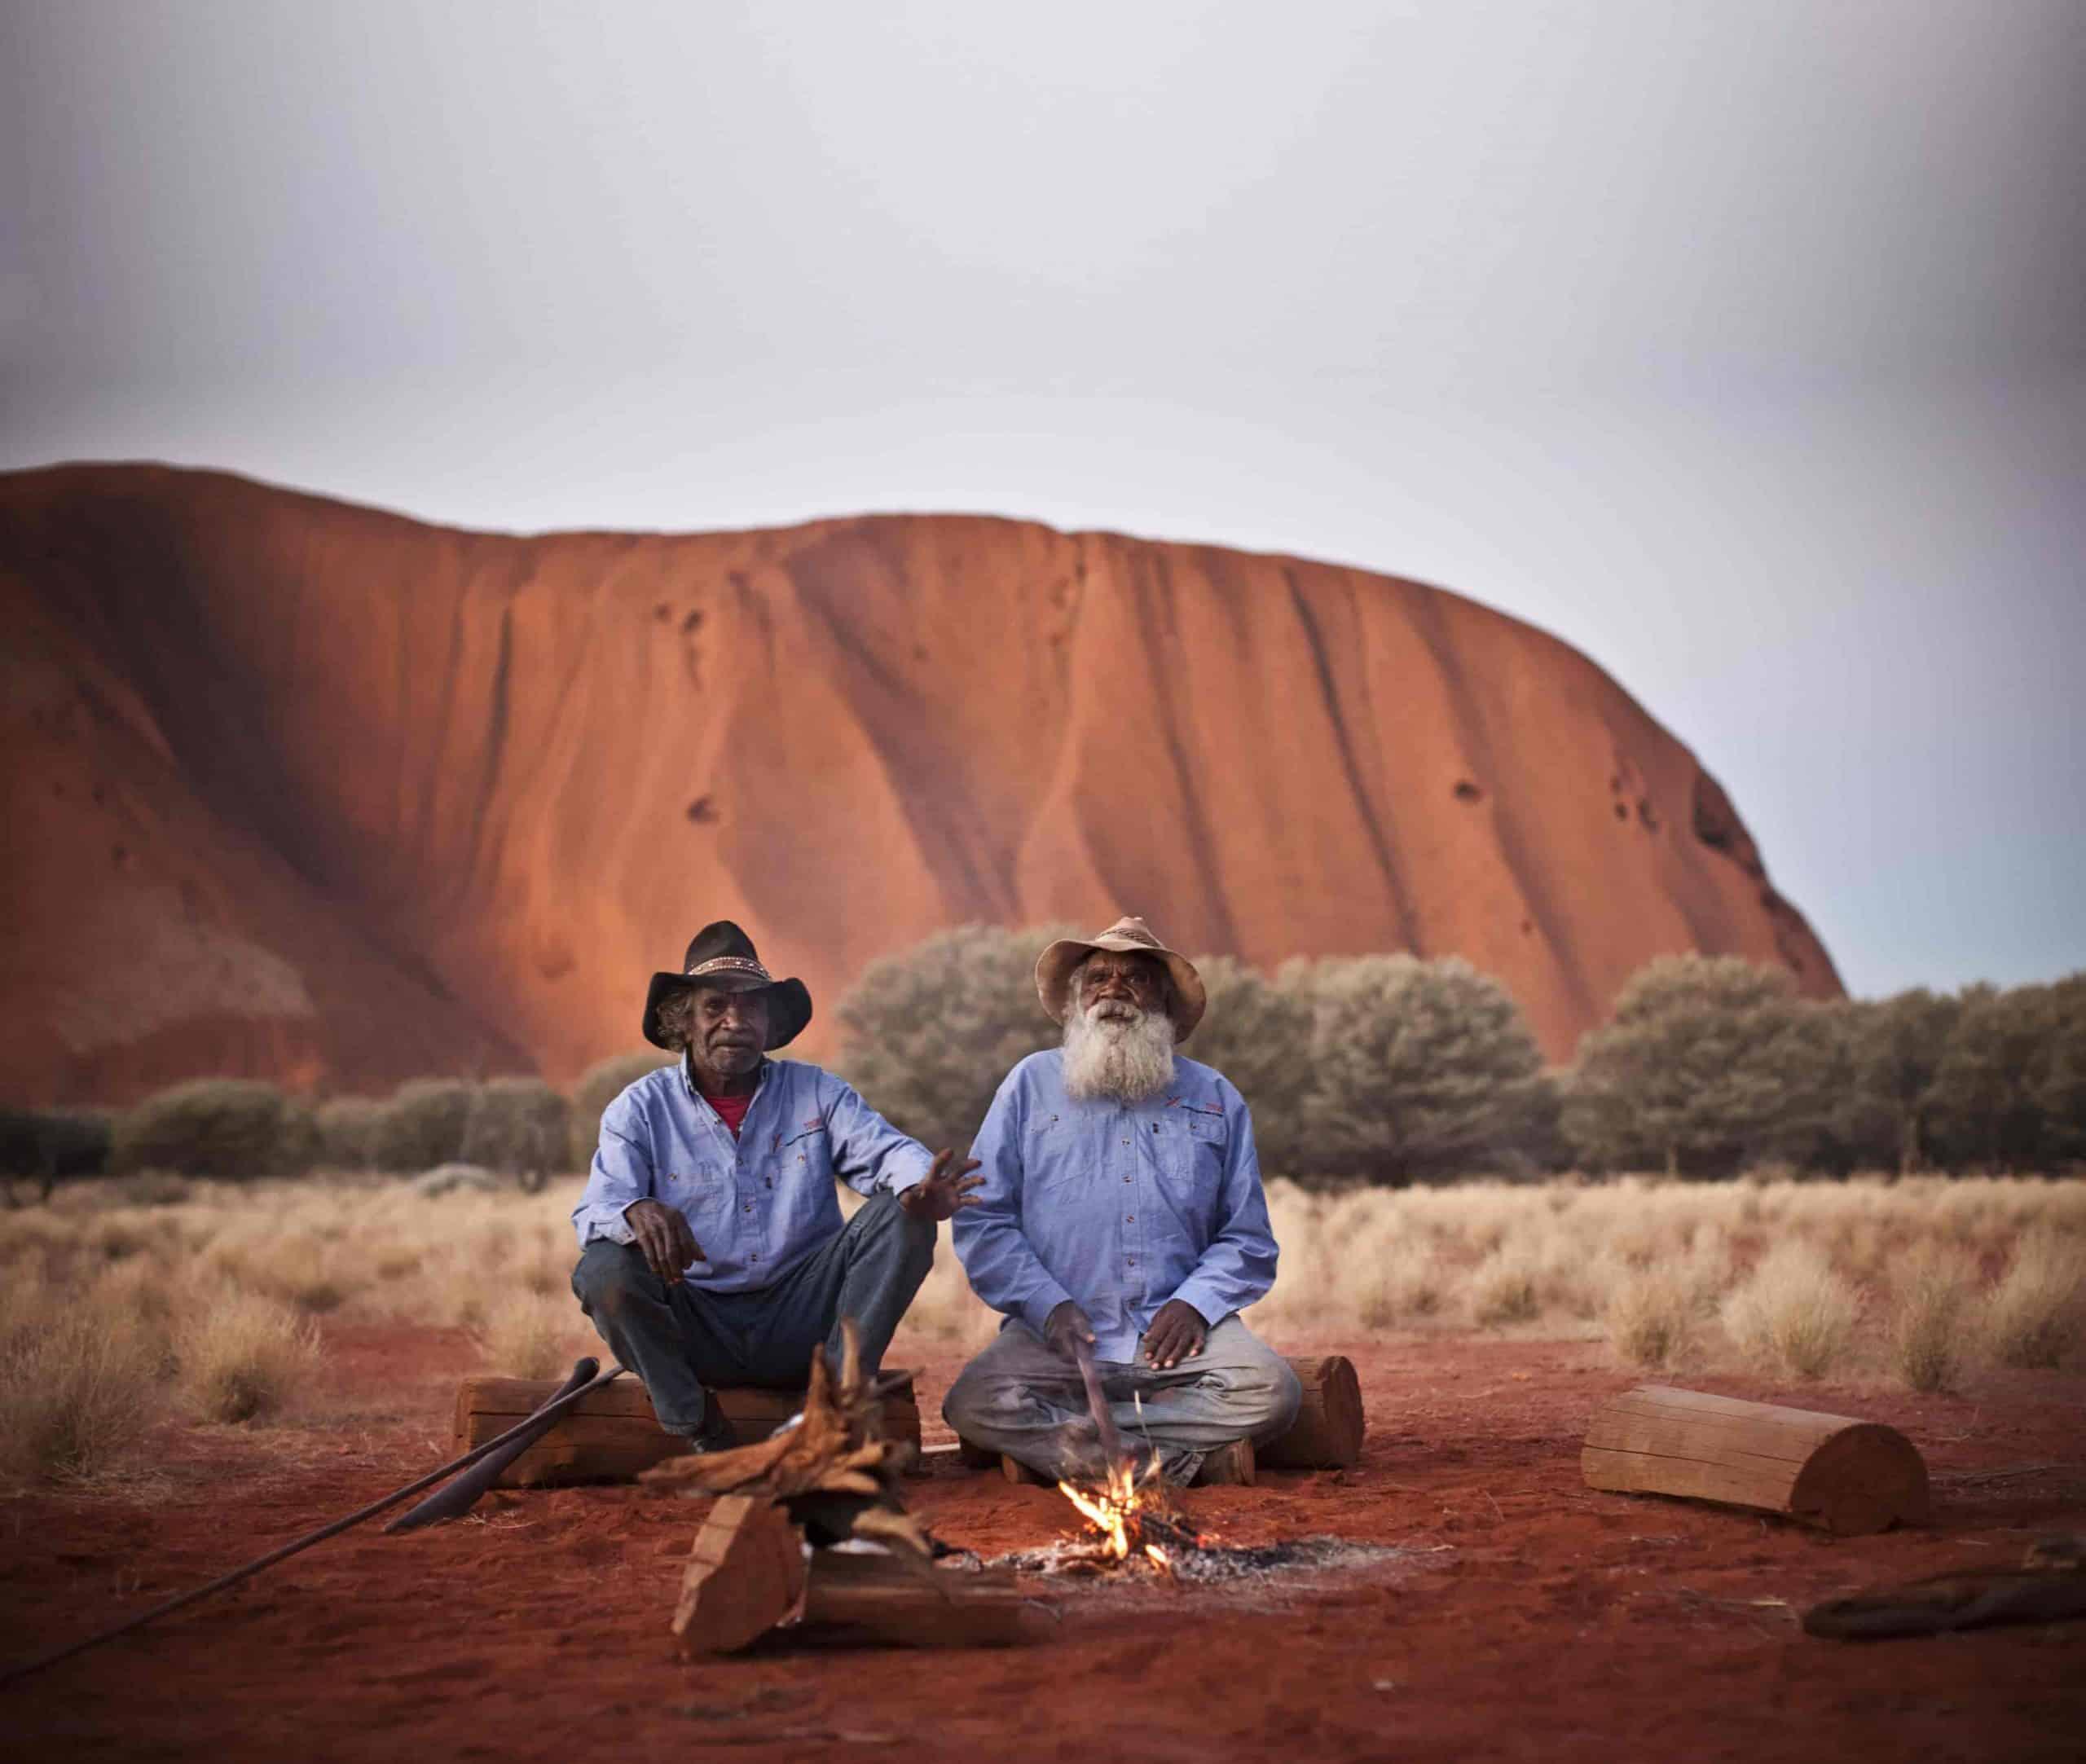 Ayers Rock/Uluru, Australien